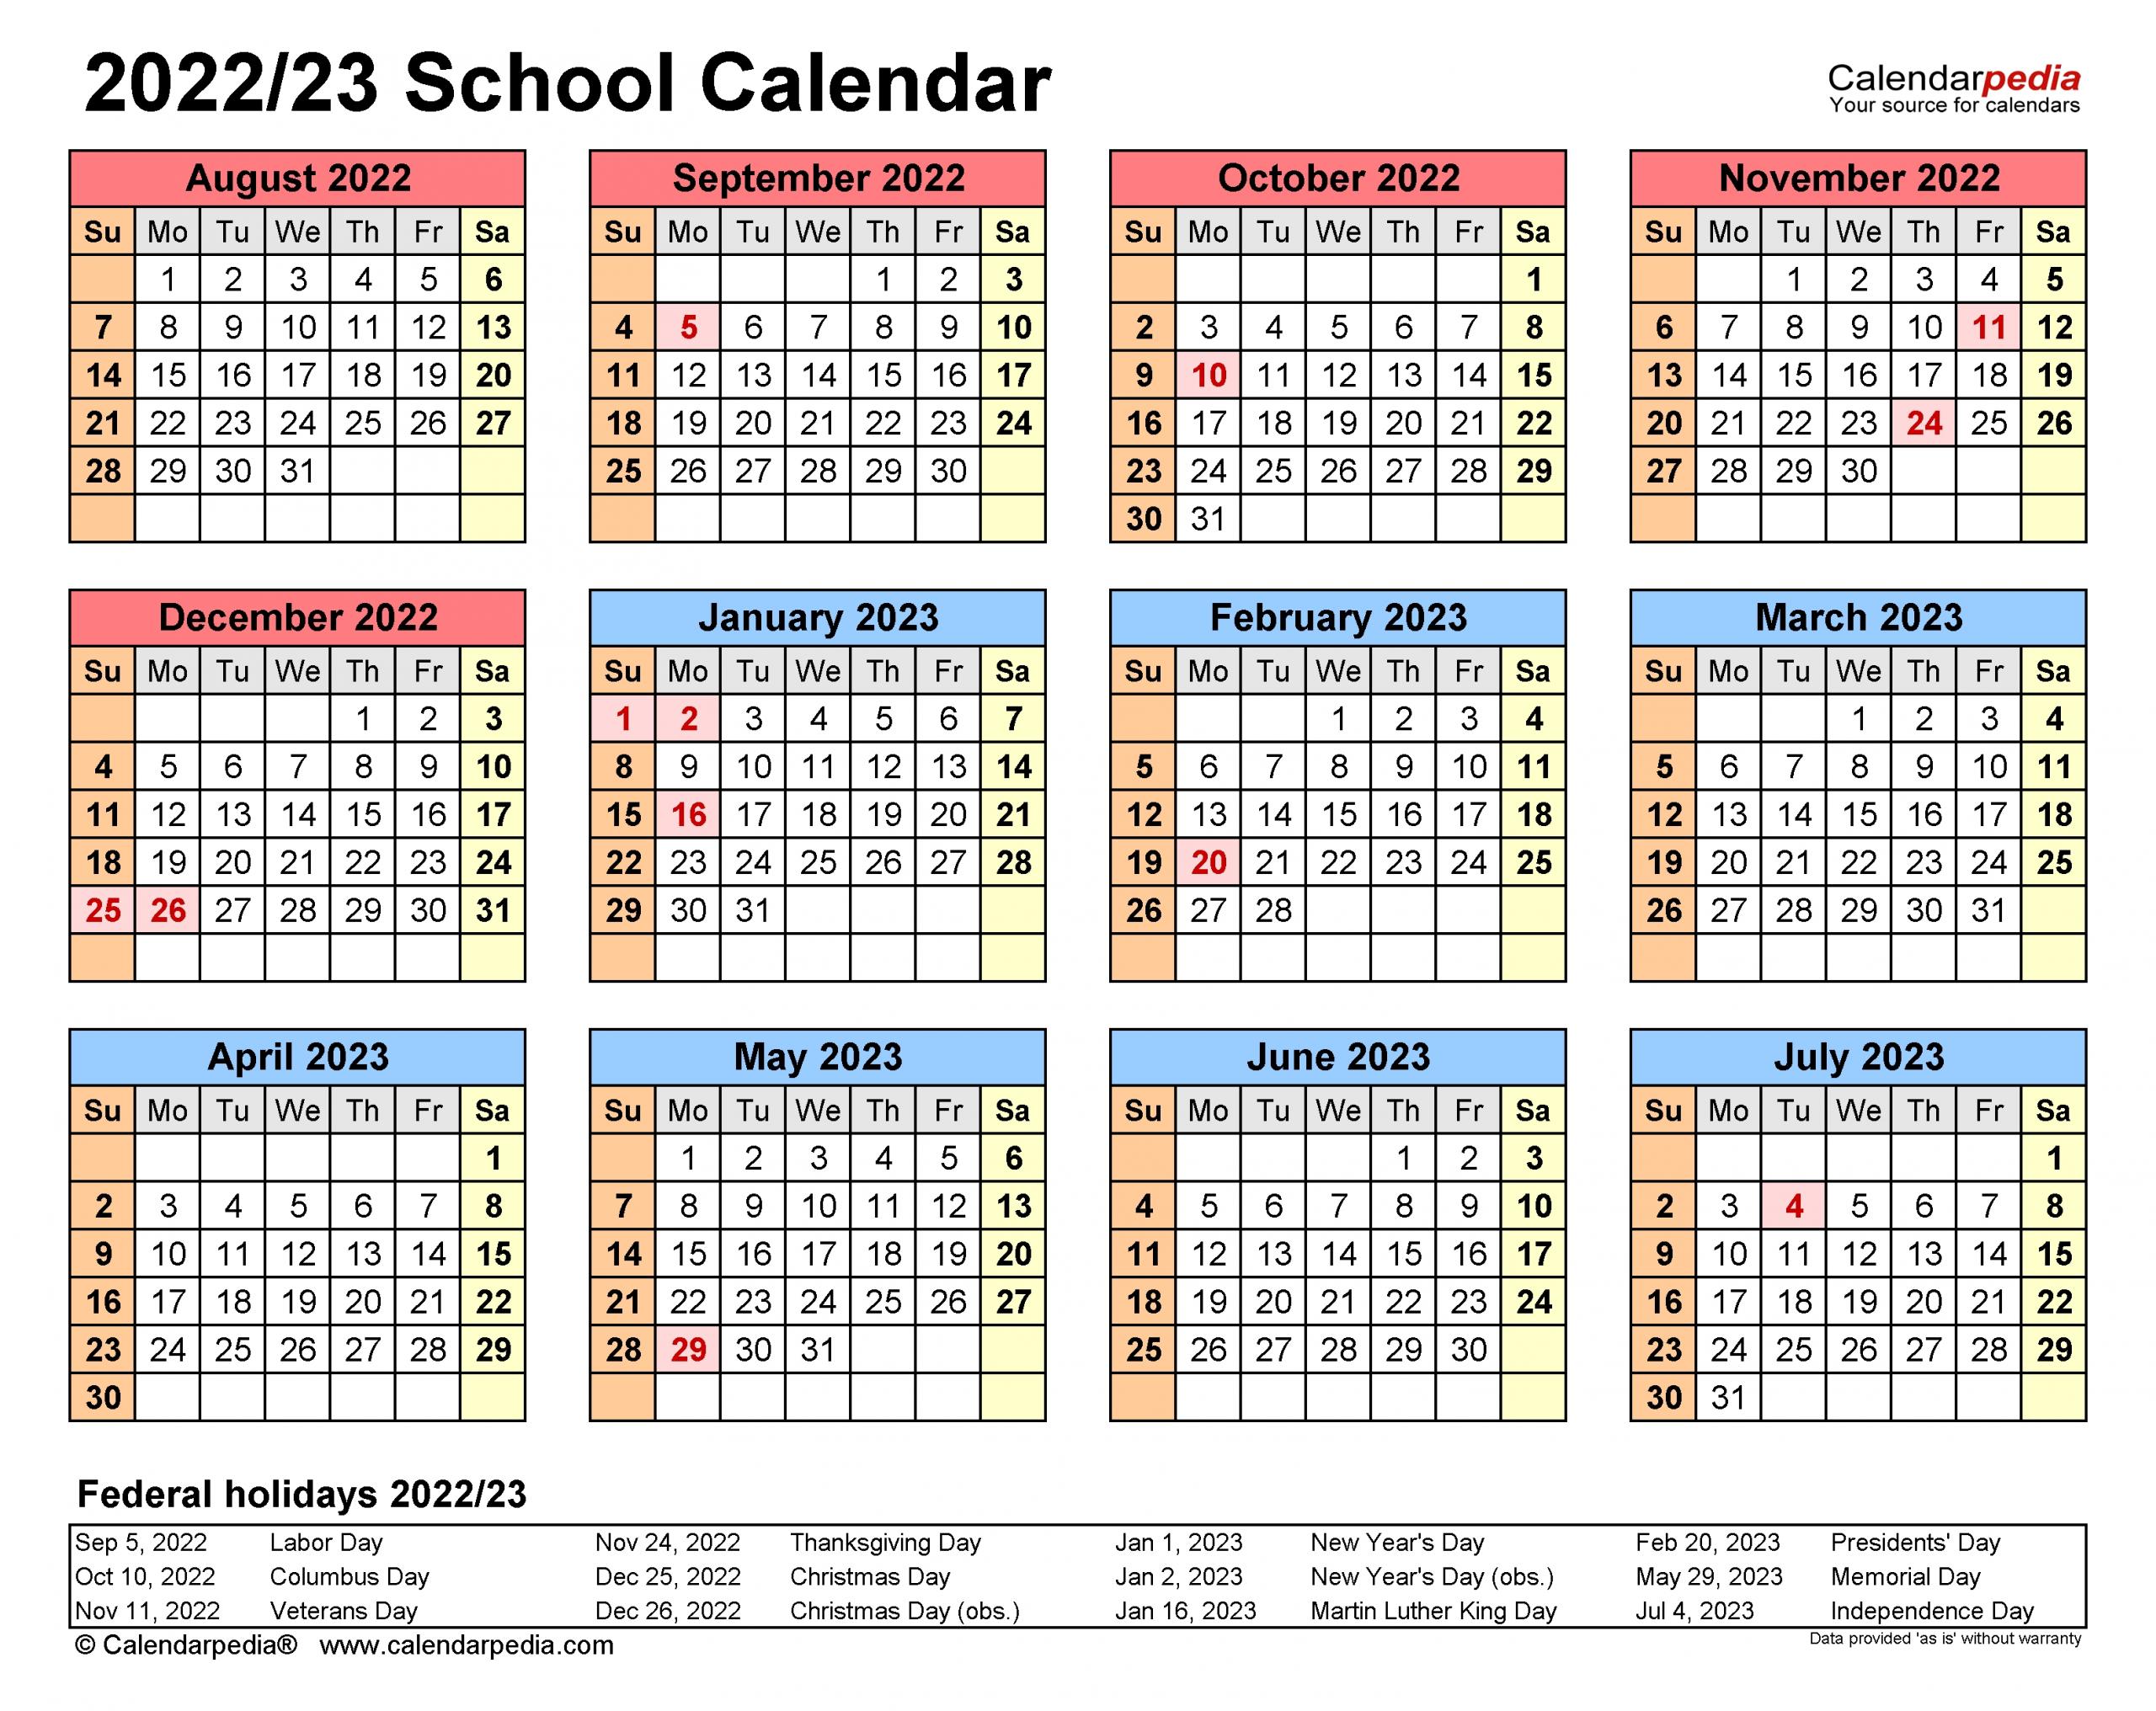 School Calendars 2022/2023 - Free Printable Excel Templates